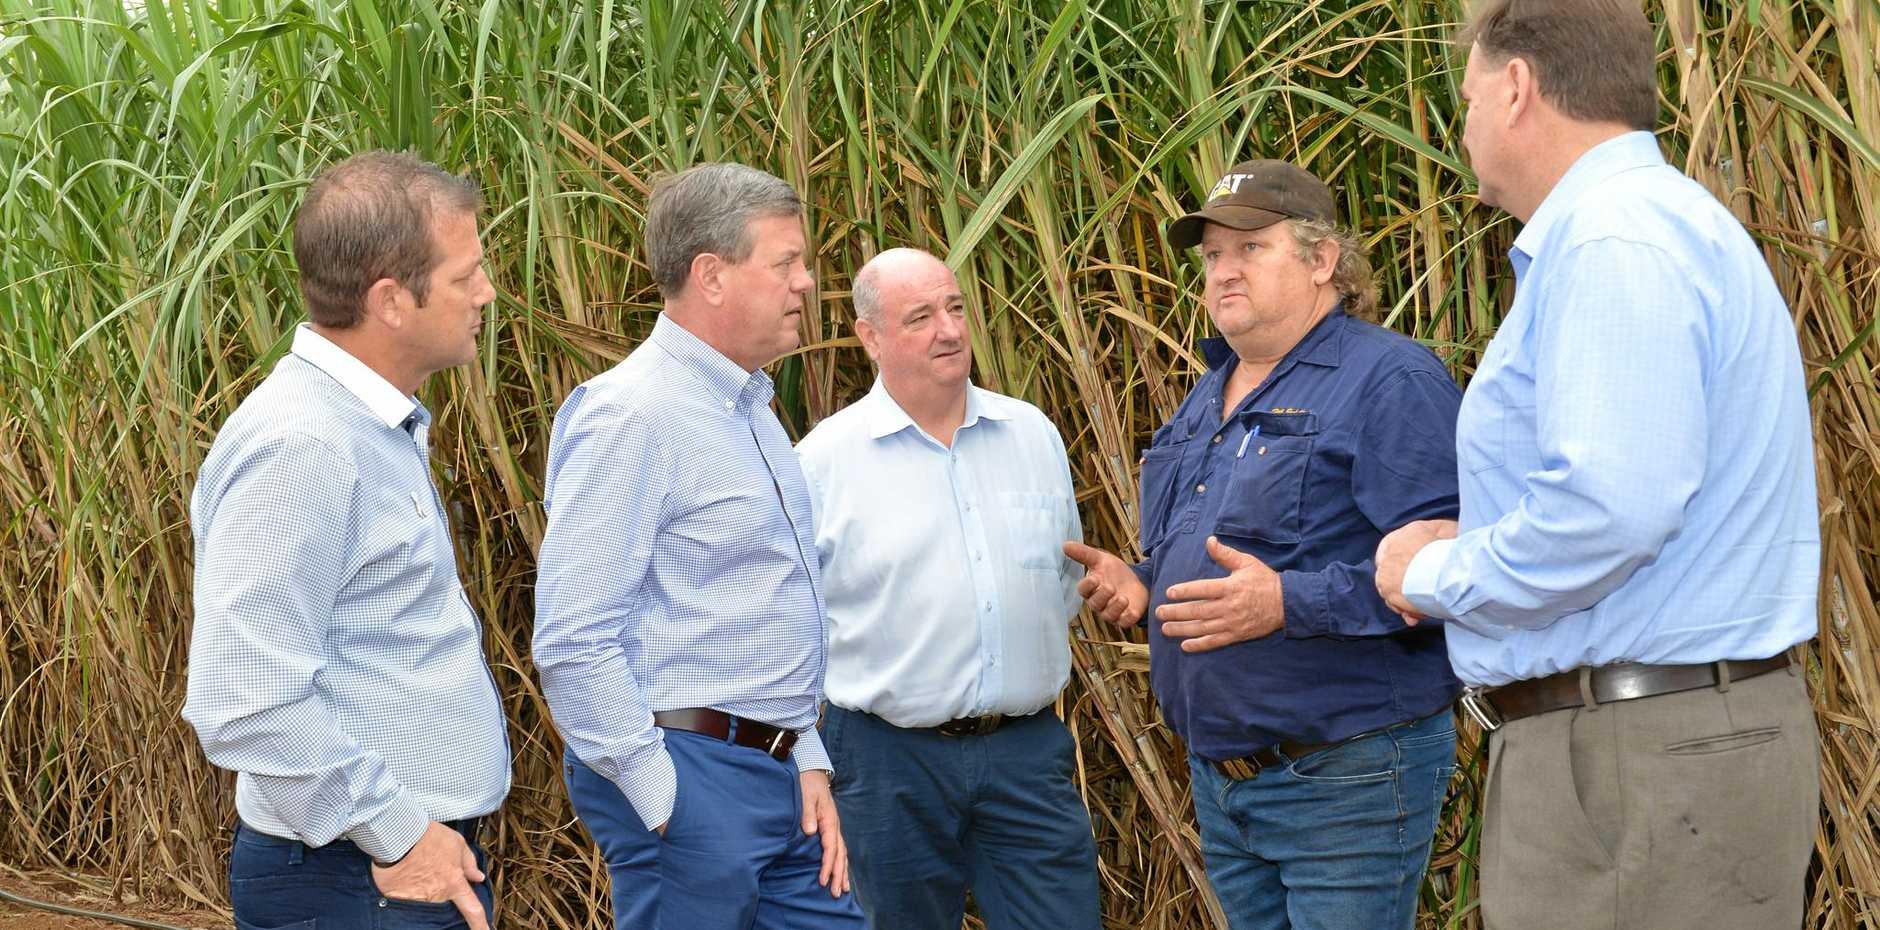 BIG ISSUE: Opposition leader Tim Nicholls at Mark Pressler's cane farm in Bundaberg yesterday.